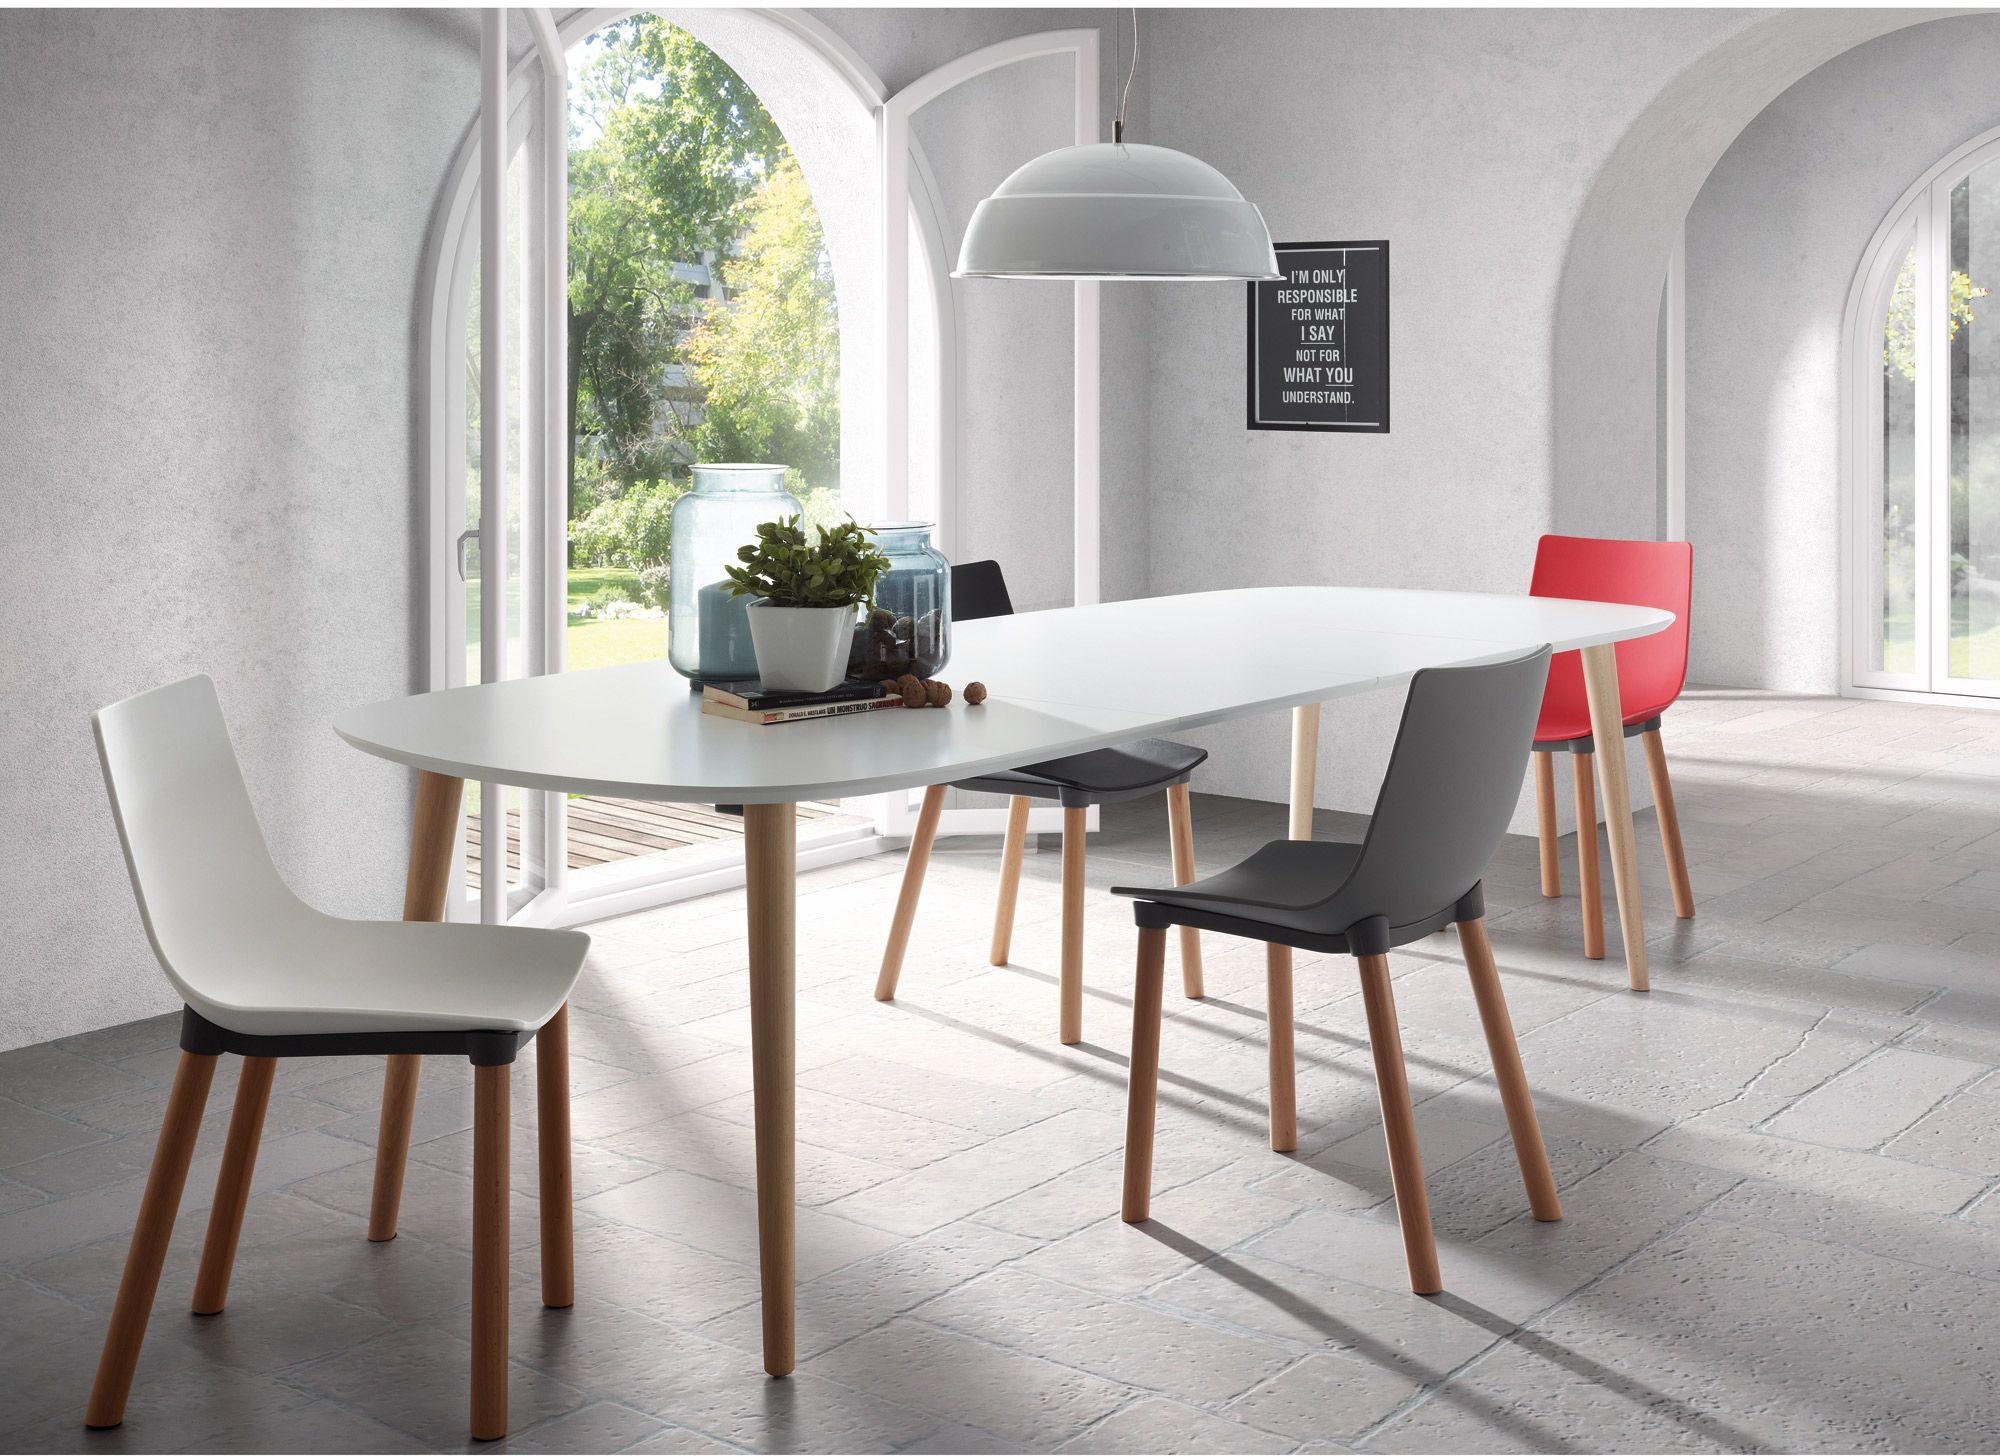 Oqui tafel ovaal laforma wit interieur